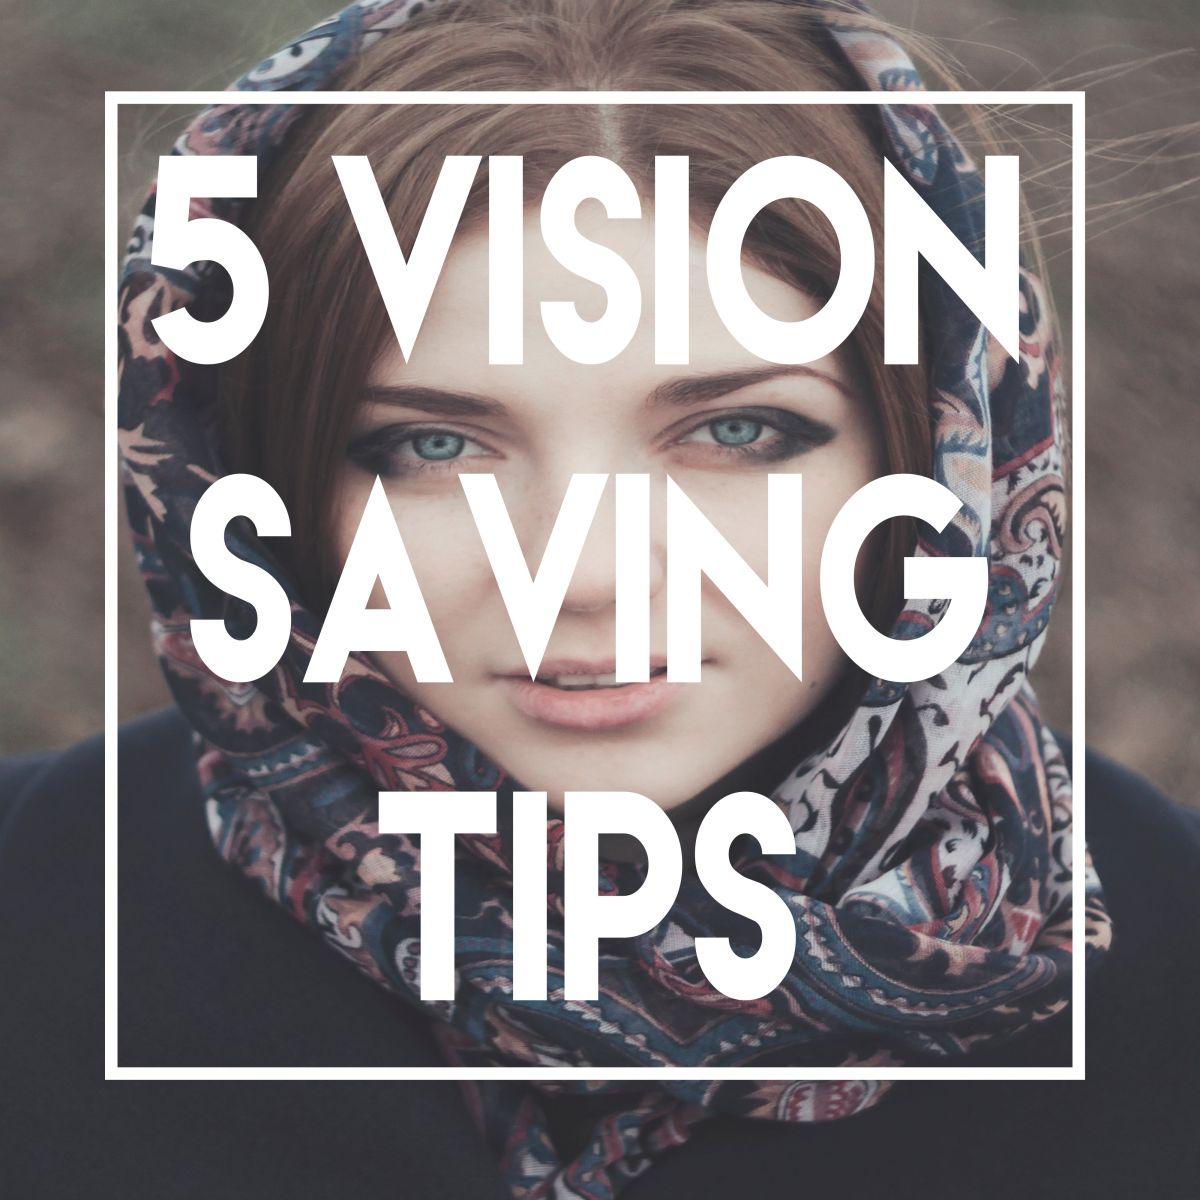 Vision saving tips image